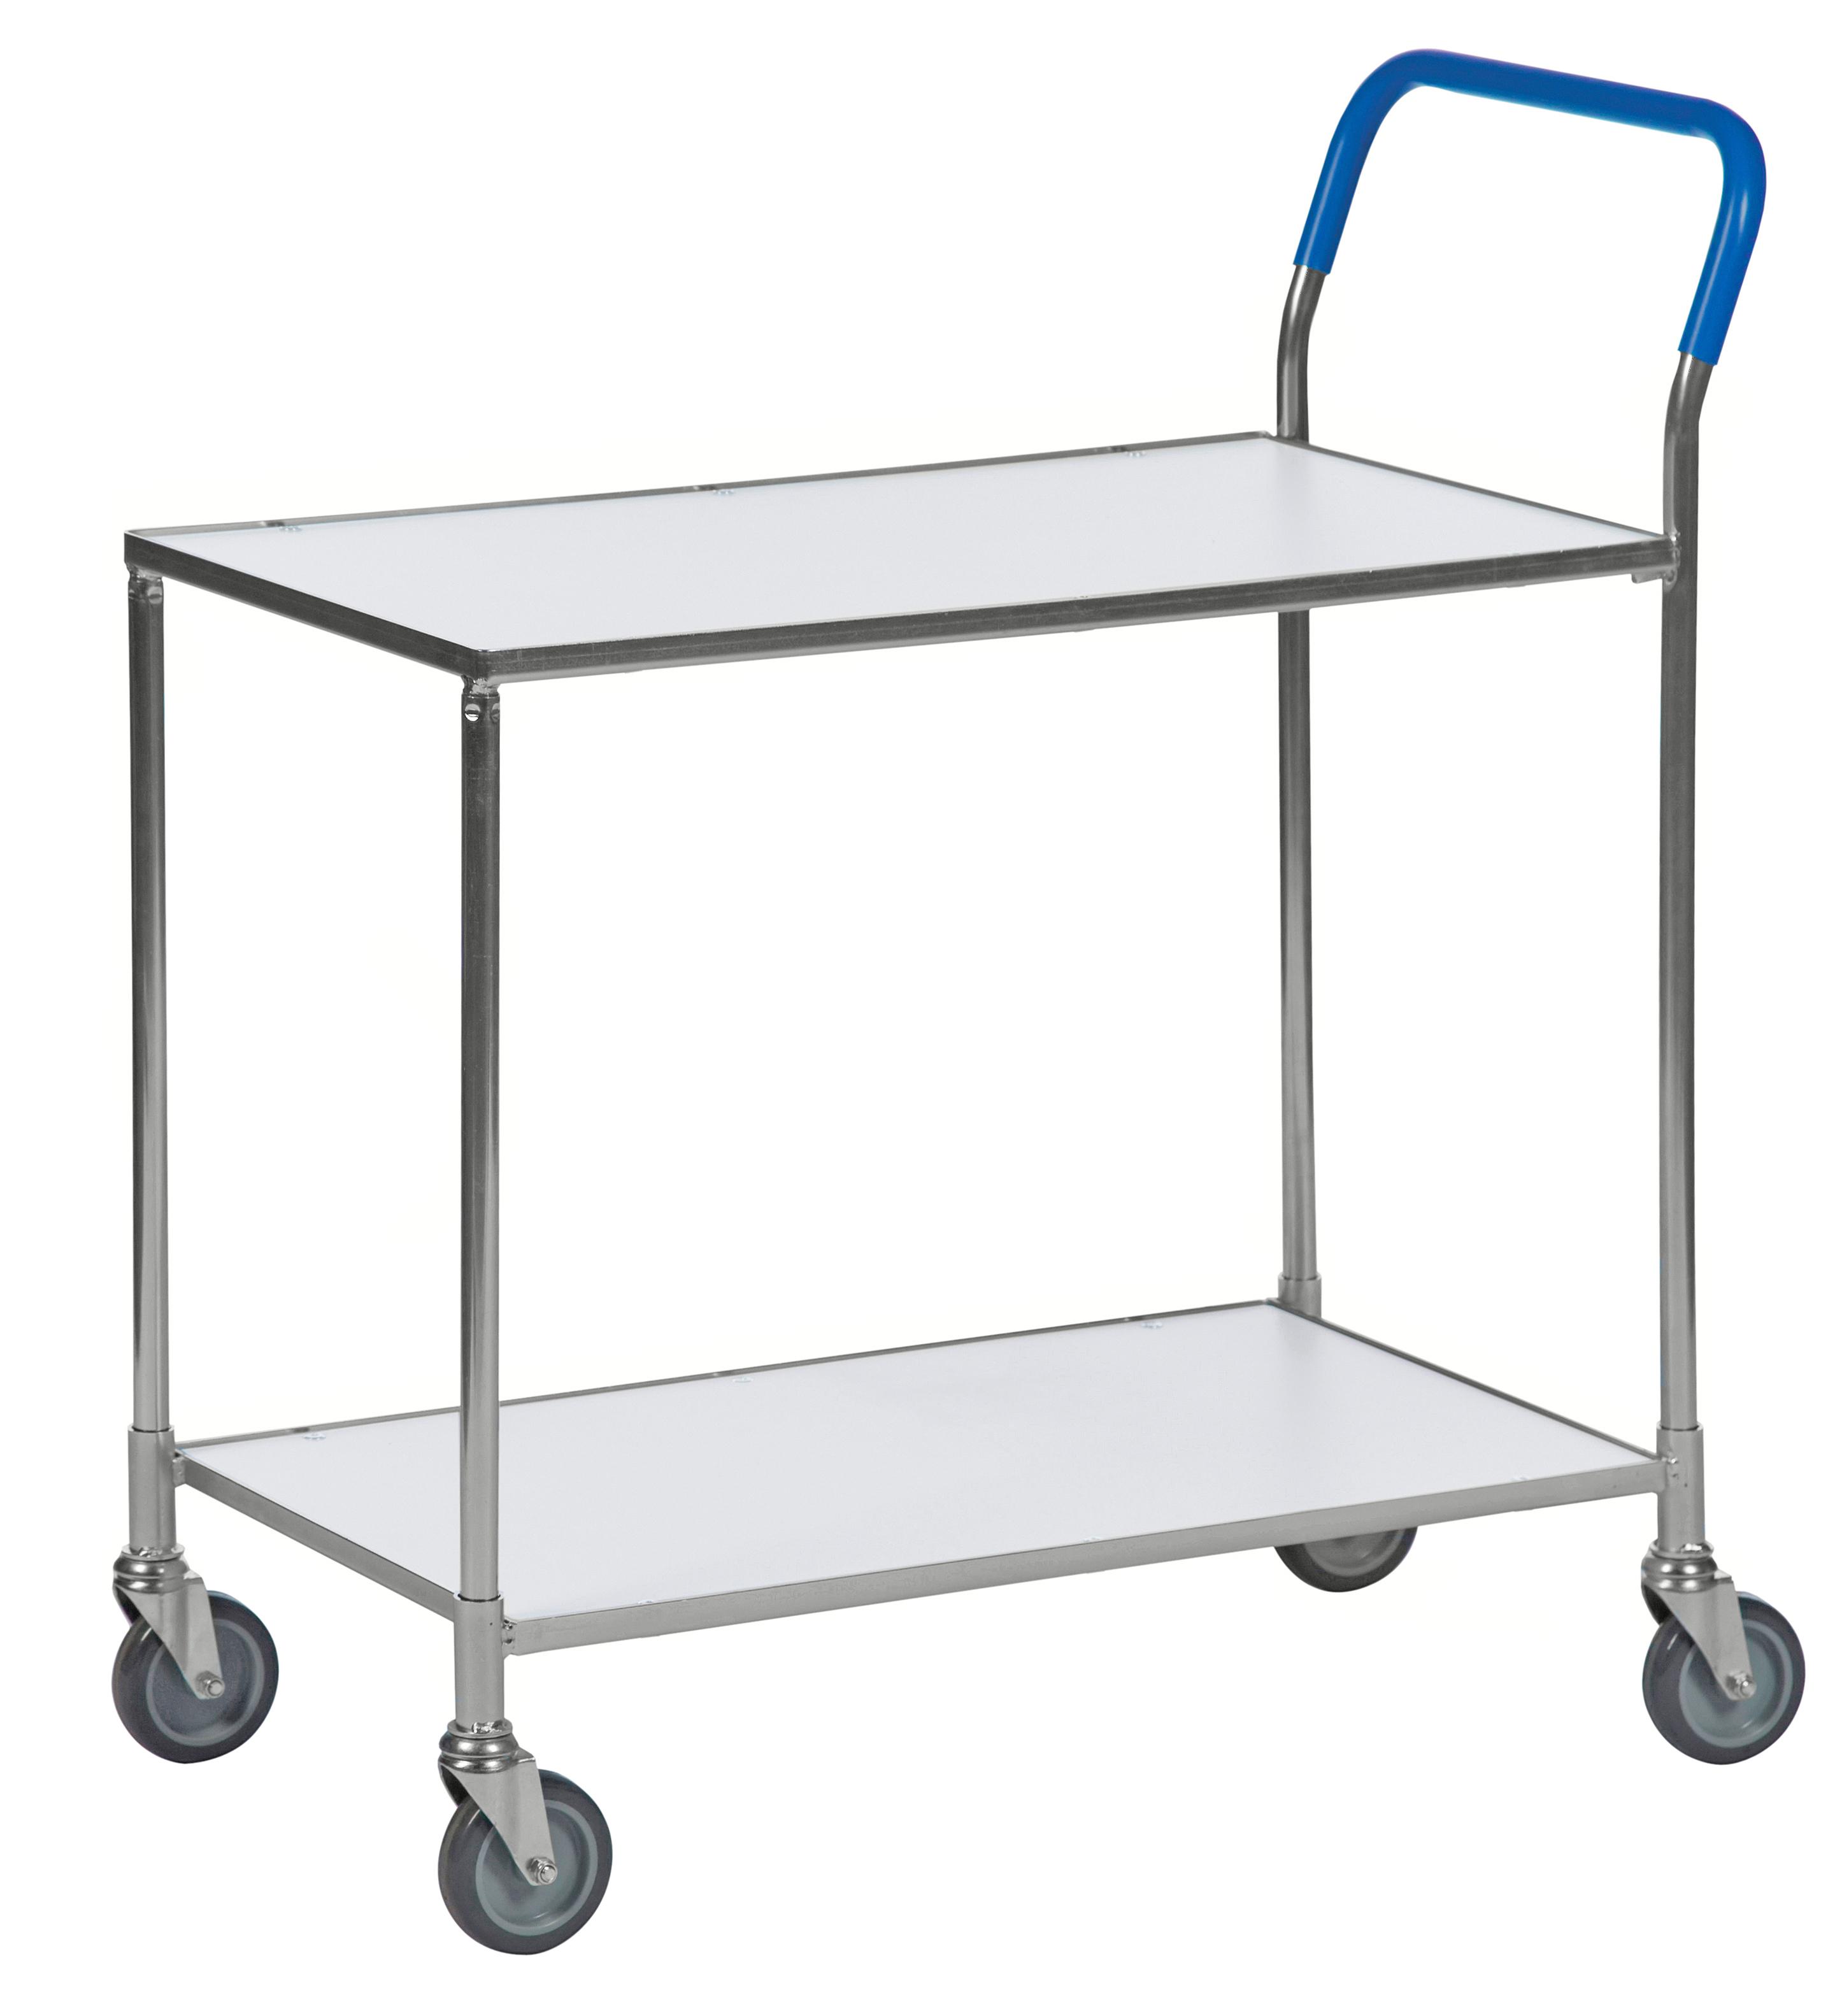 Table trolley KM1720-6